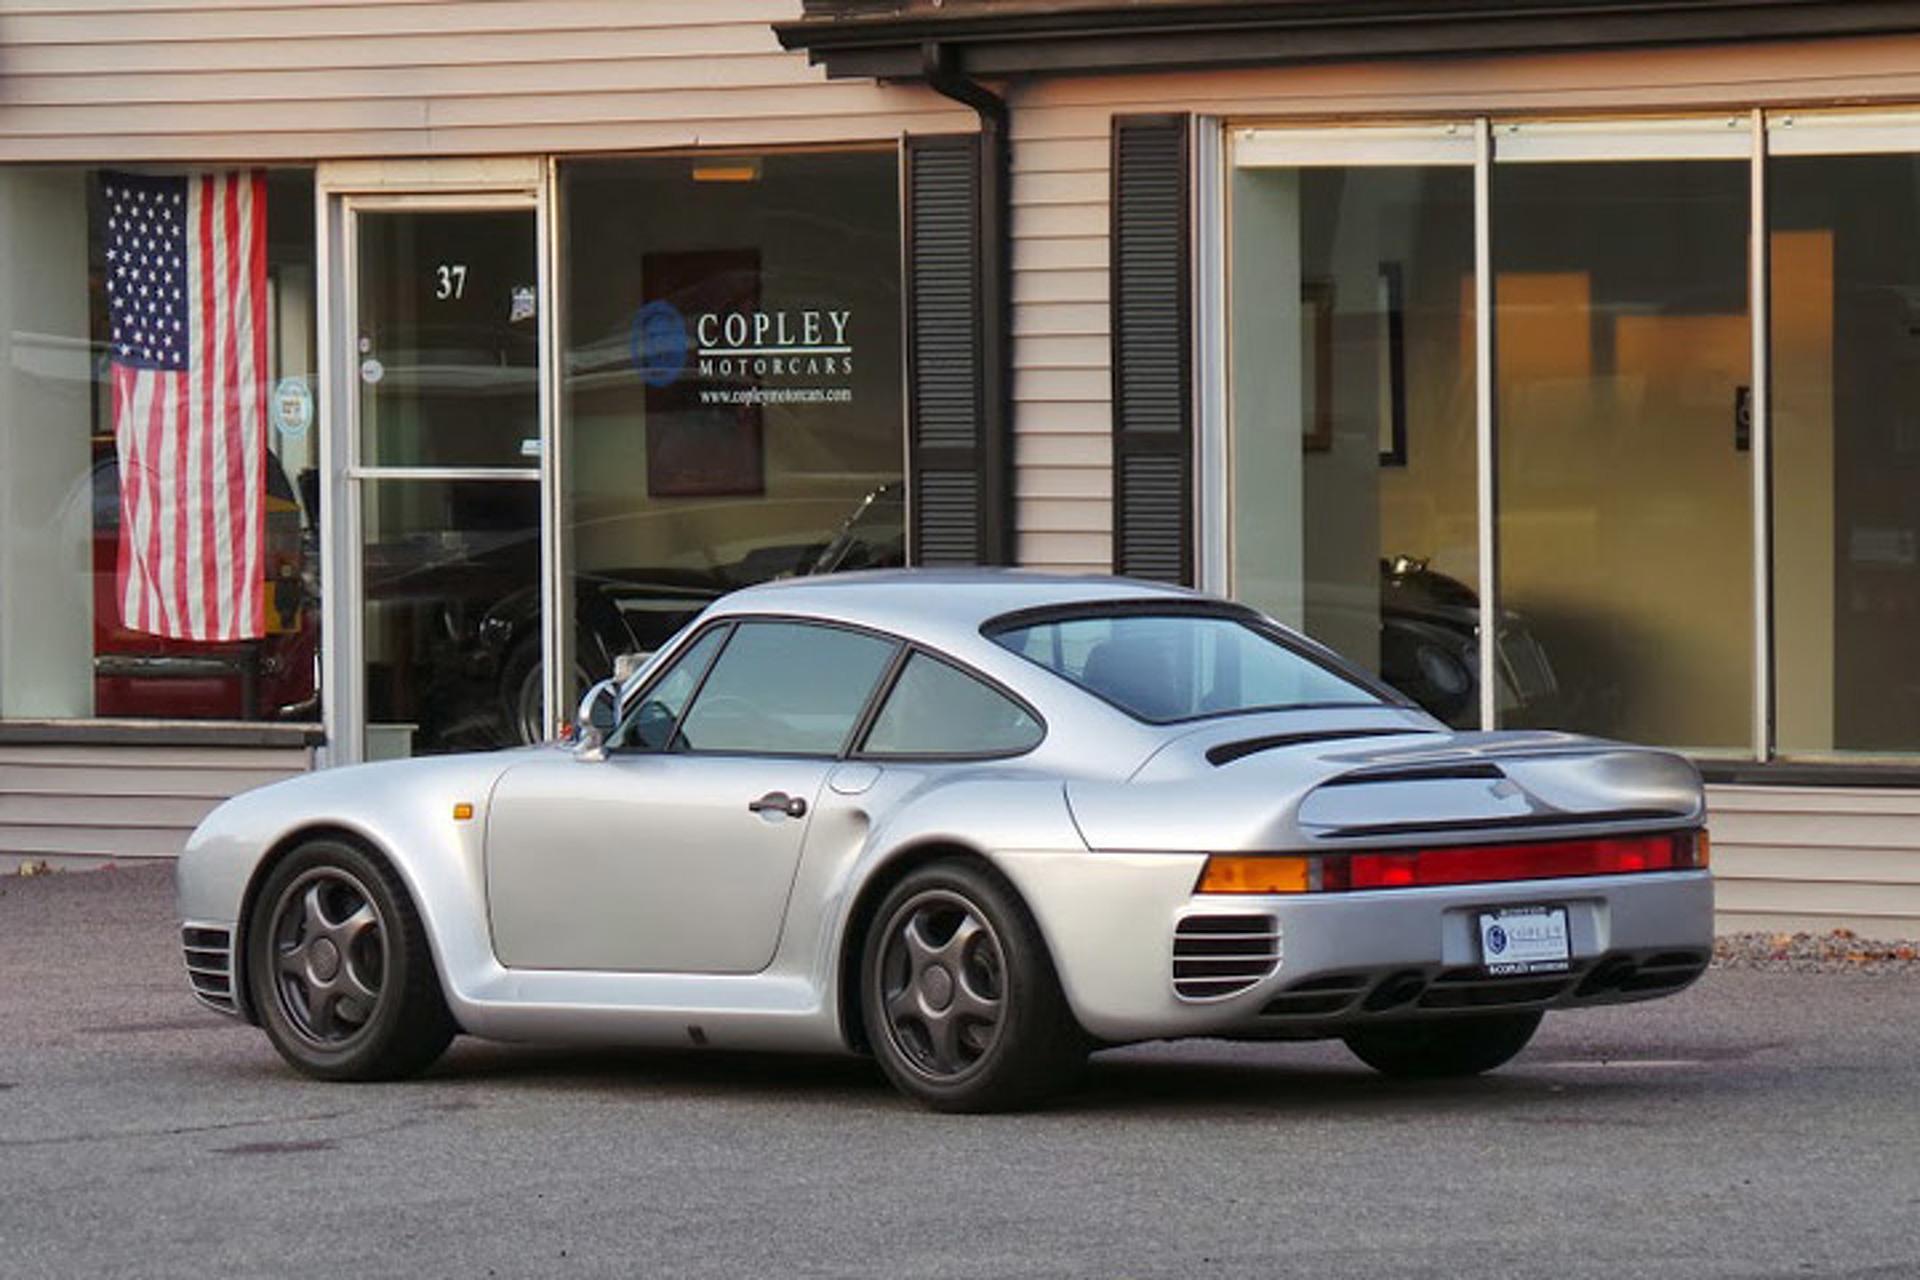 Low Mileage Porsche 959 Will Set You Back $1.4 Million